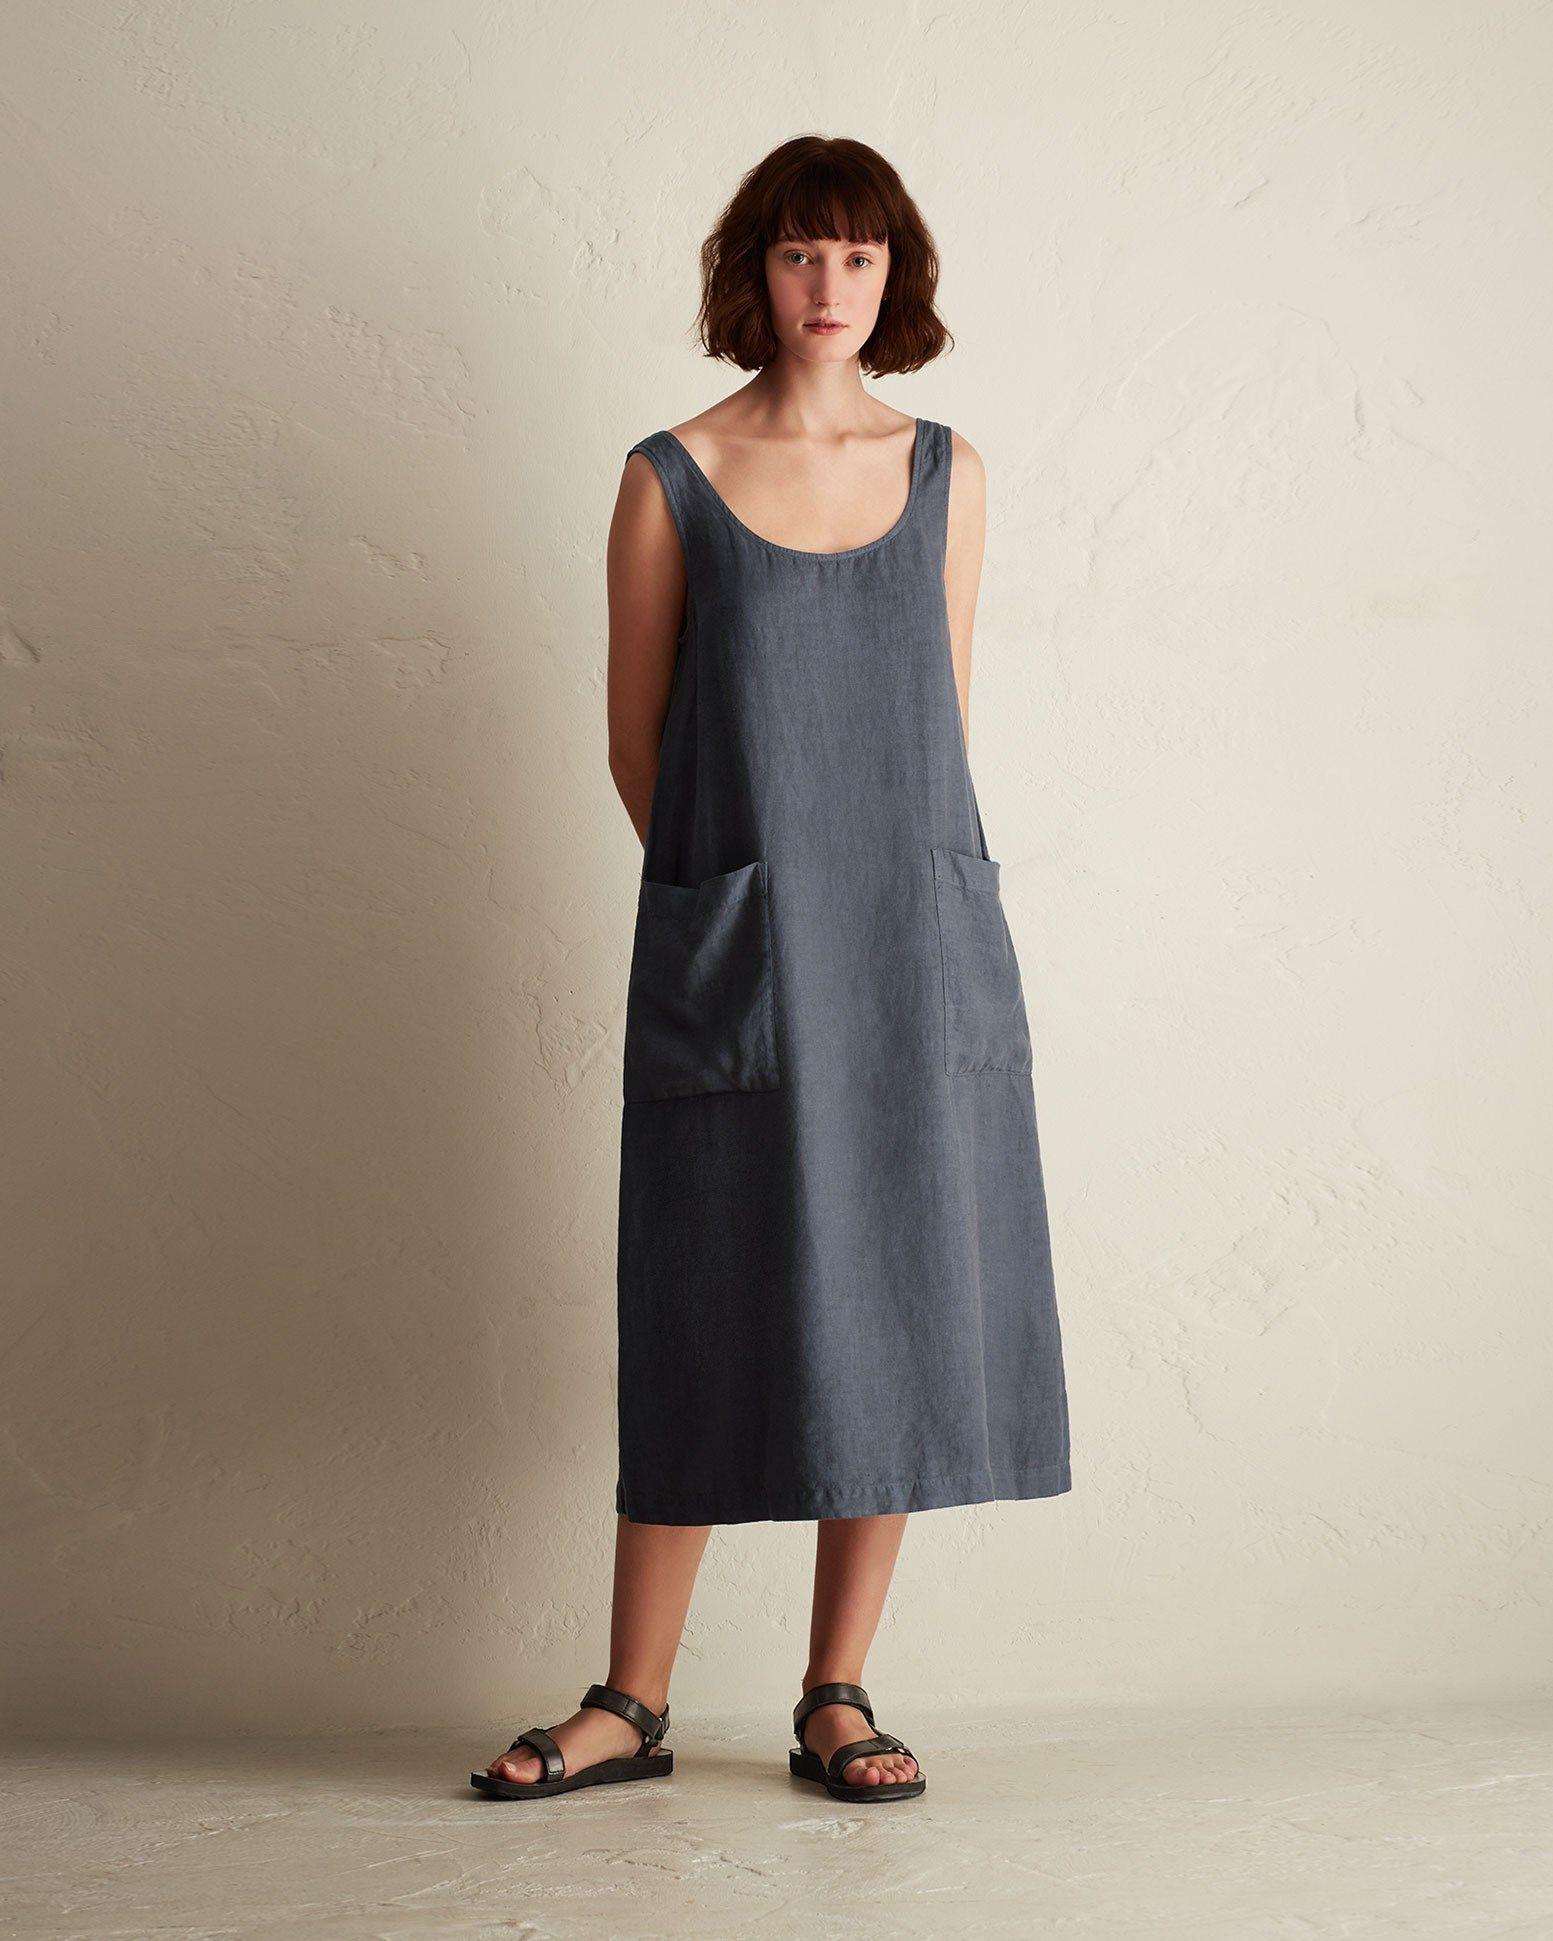 Easy sun dress in a lightweight supple linen low scoop